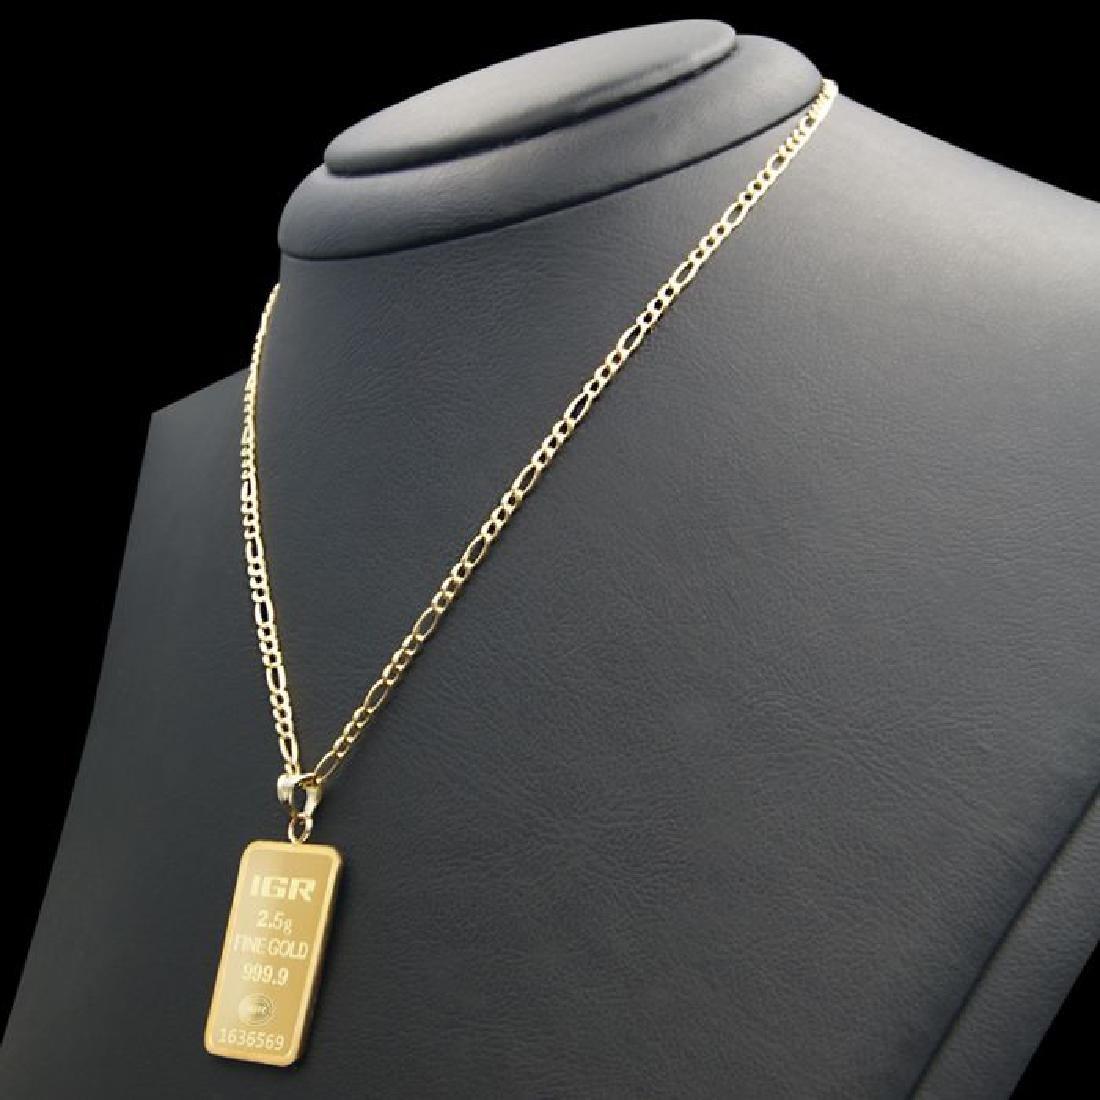 2.5 gr. pendant + 2 gr. chain. -  999/1000 & 585/1000 - 2